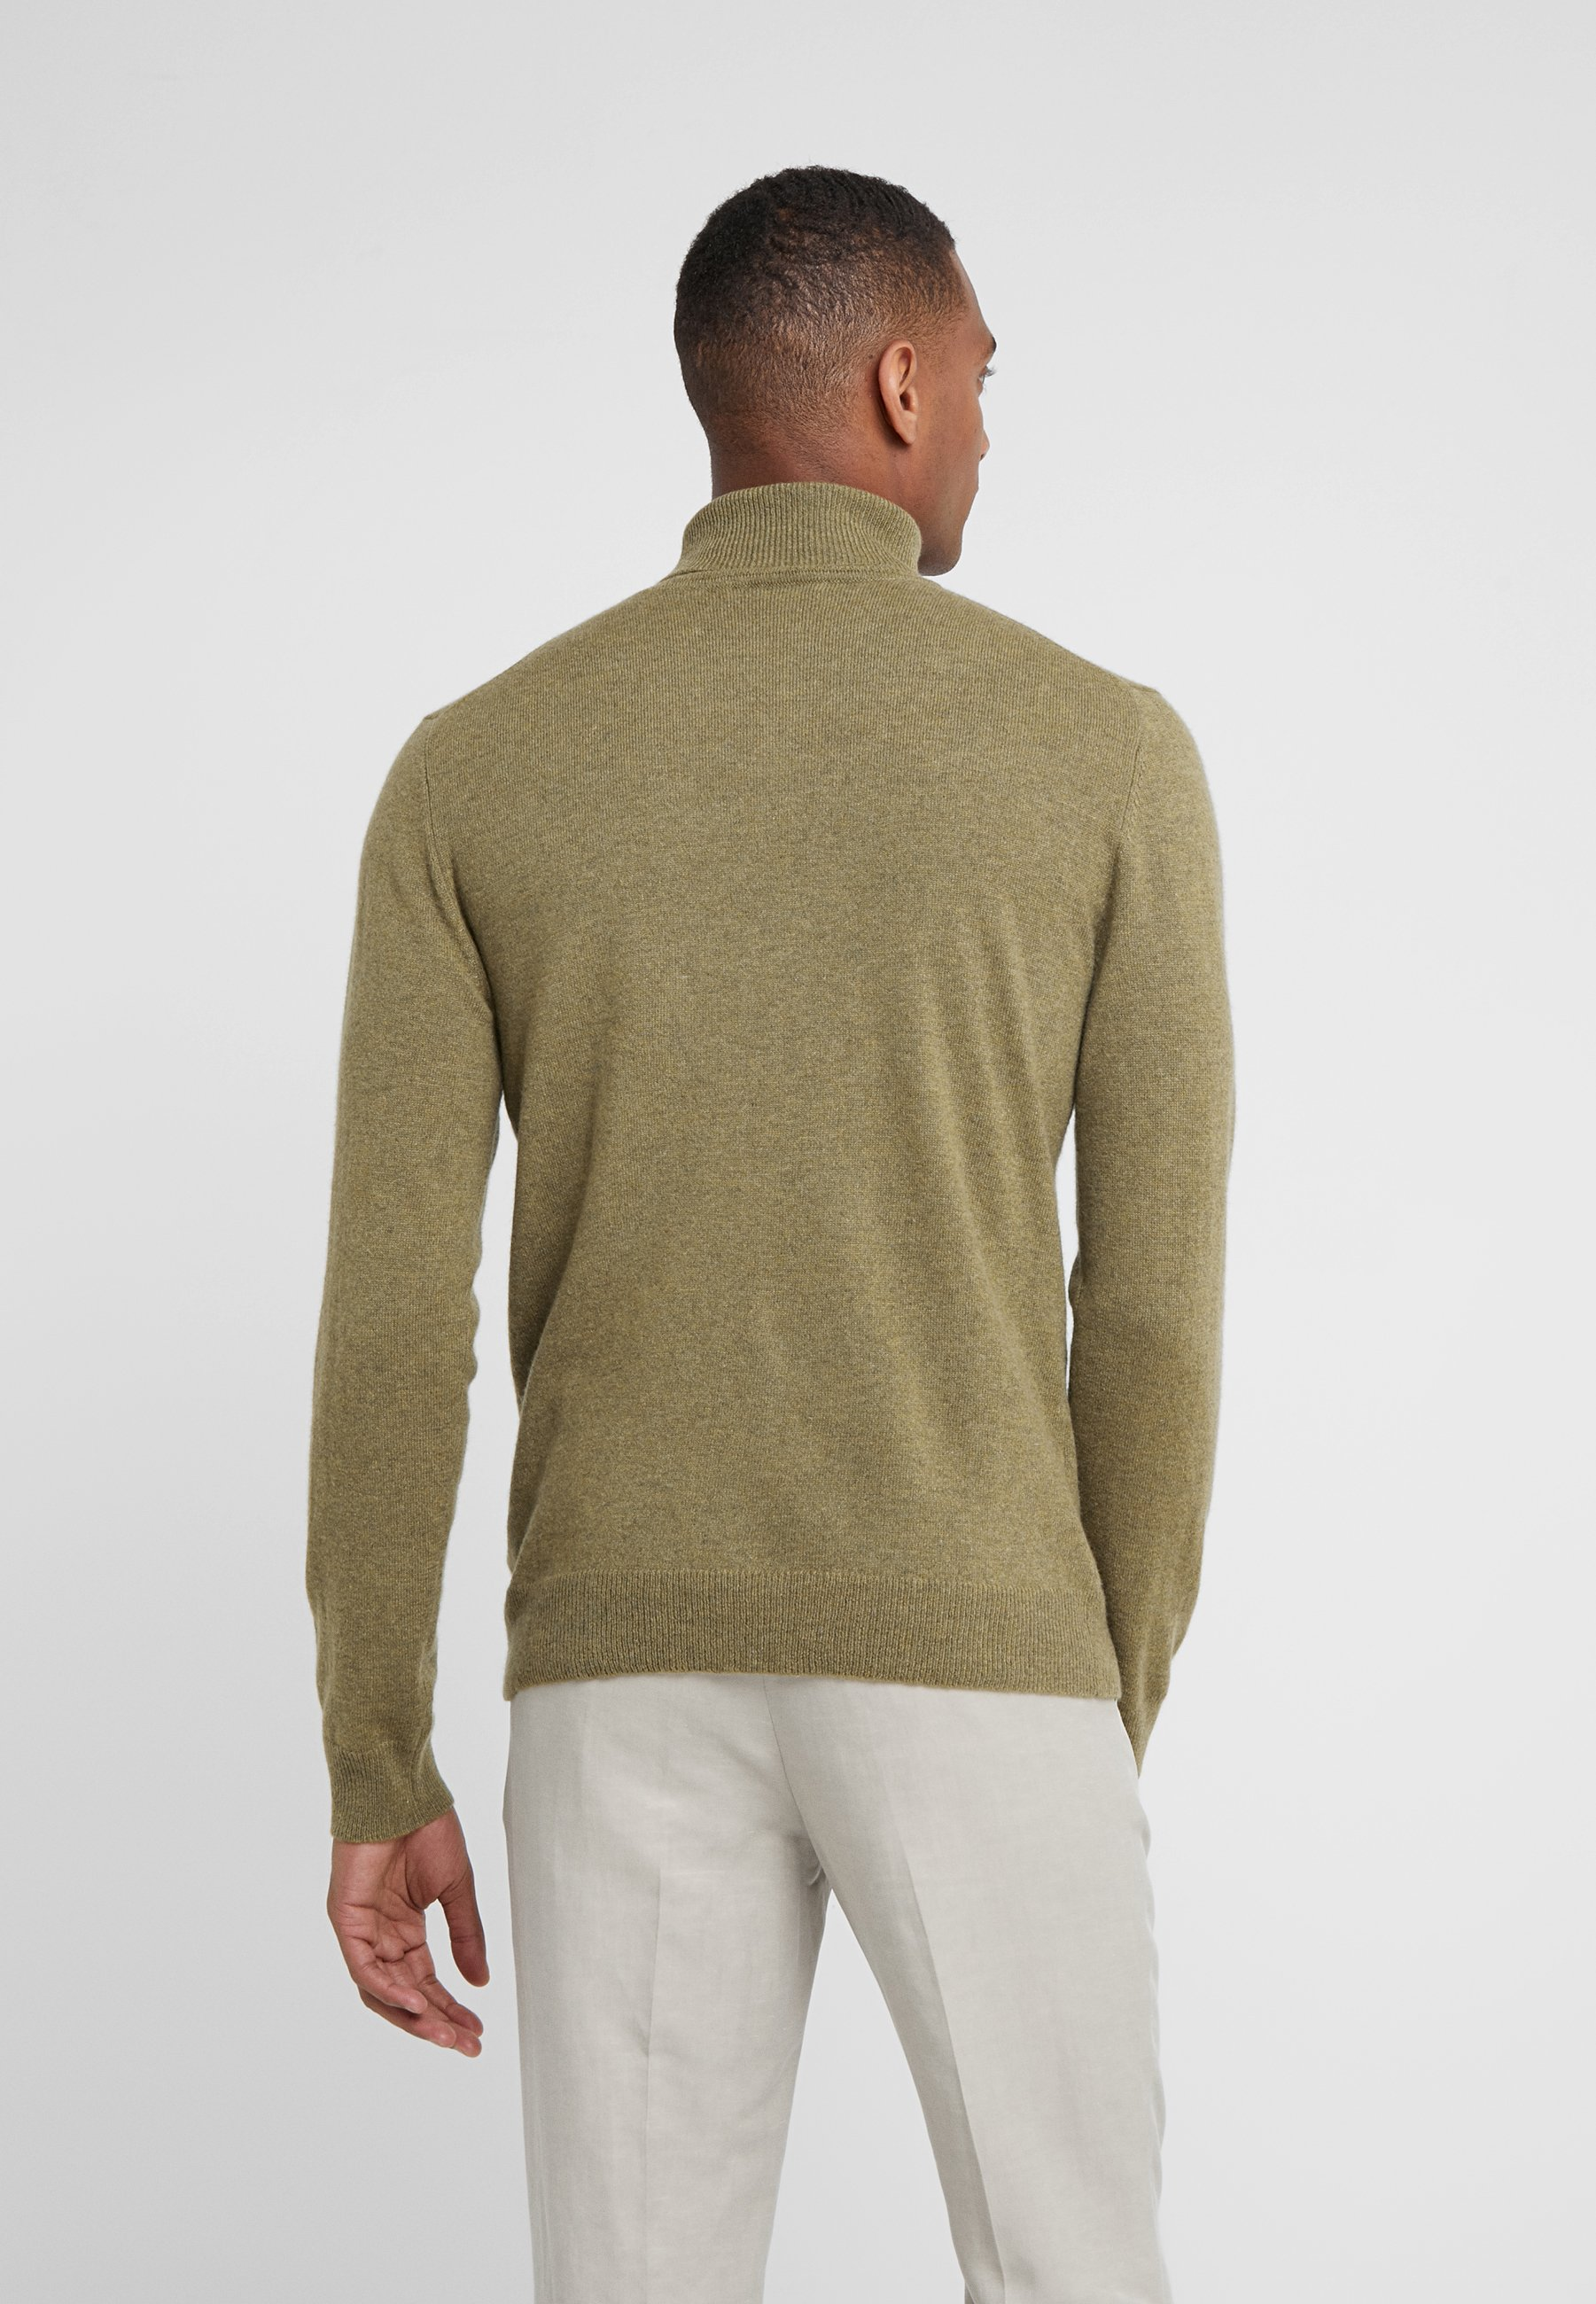 Olive Pure Olive Pure TurtleneckPullover TurtleneckPullover TurtleneckPullover Pure Pure Cashmere Cashmere Olive Cashmere g7b6IyvmYf